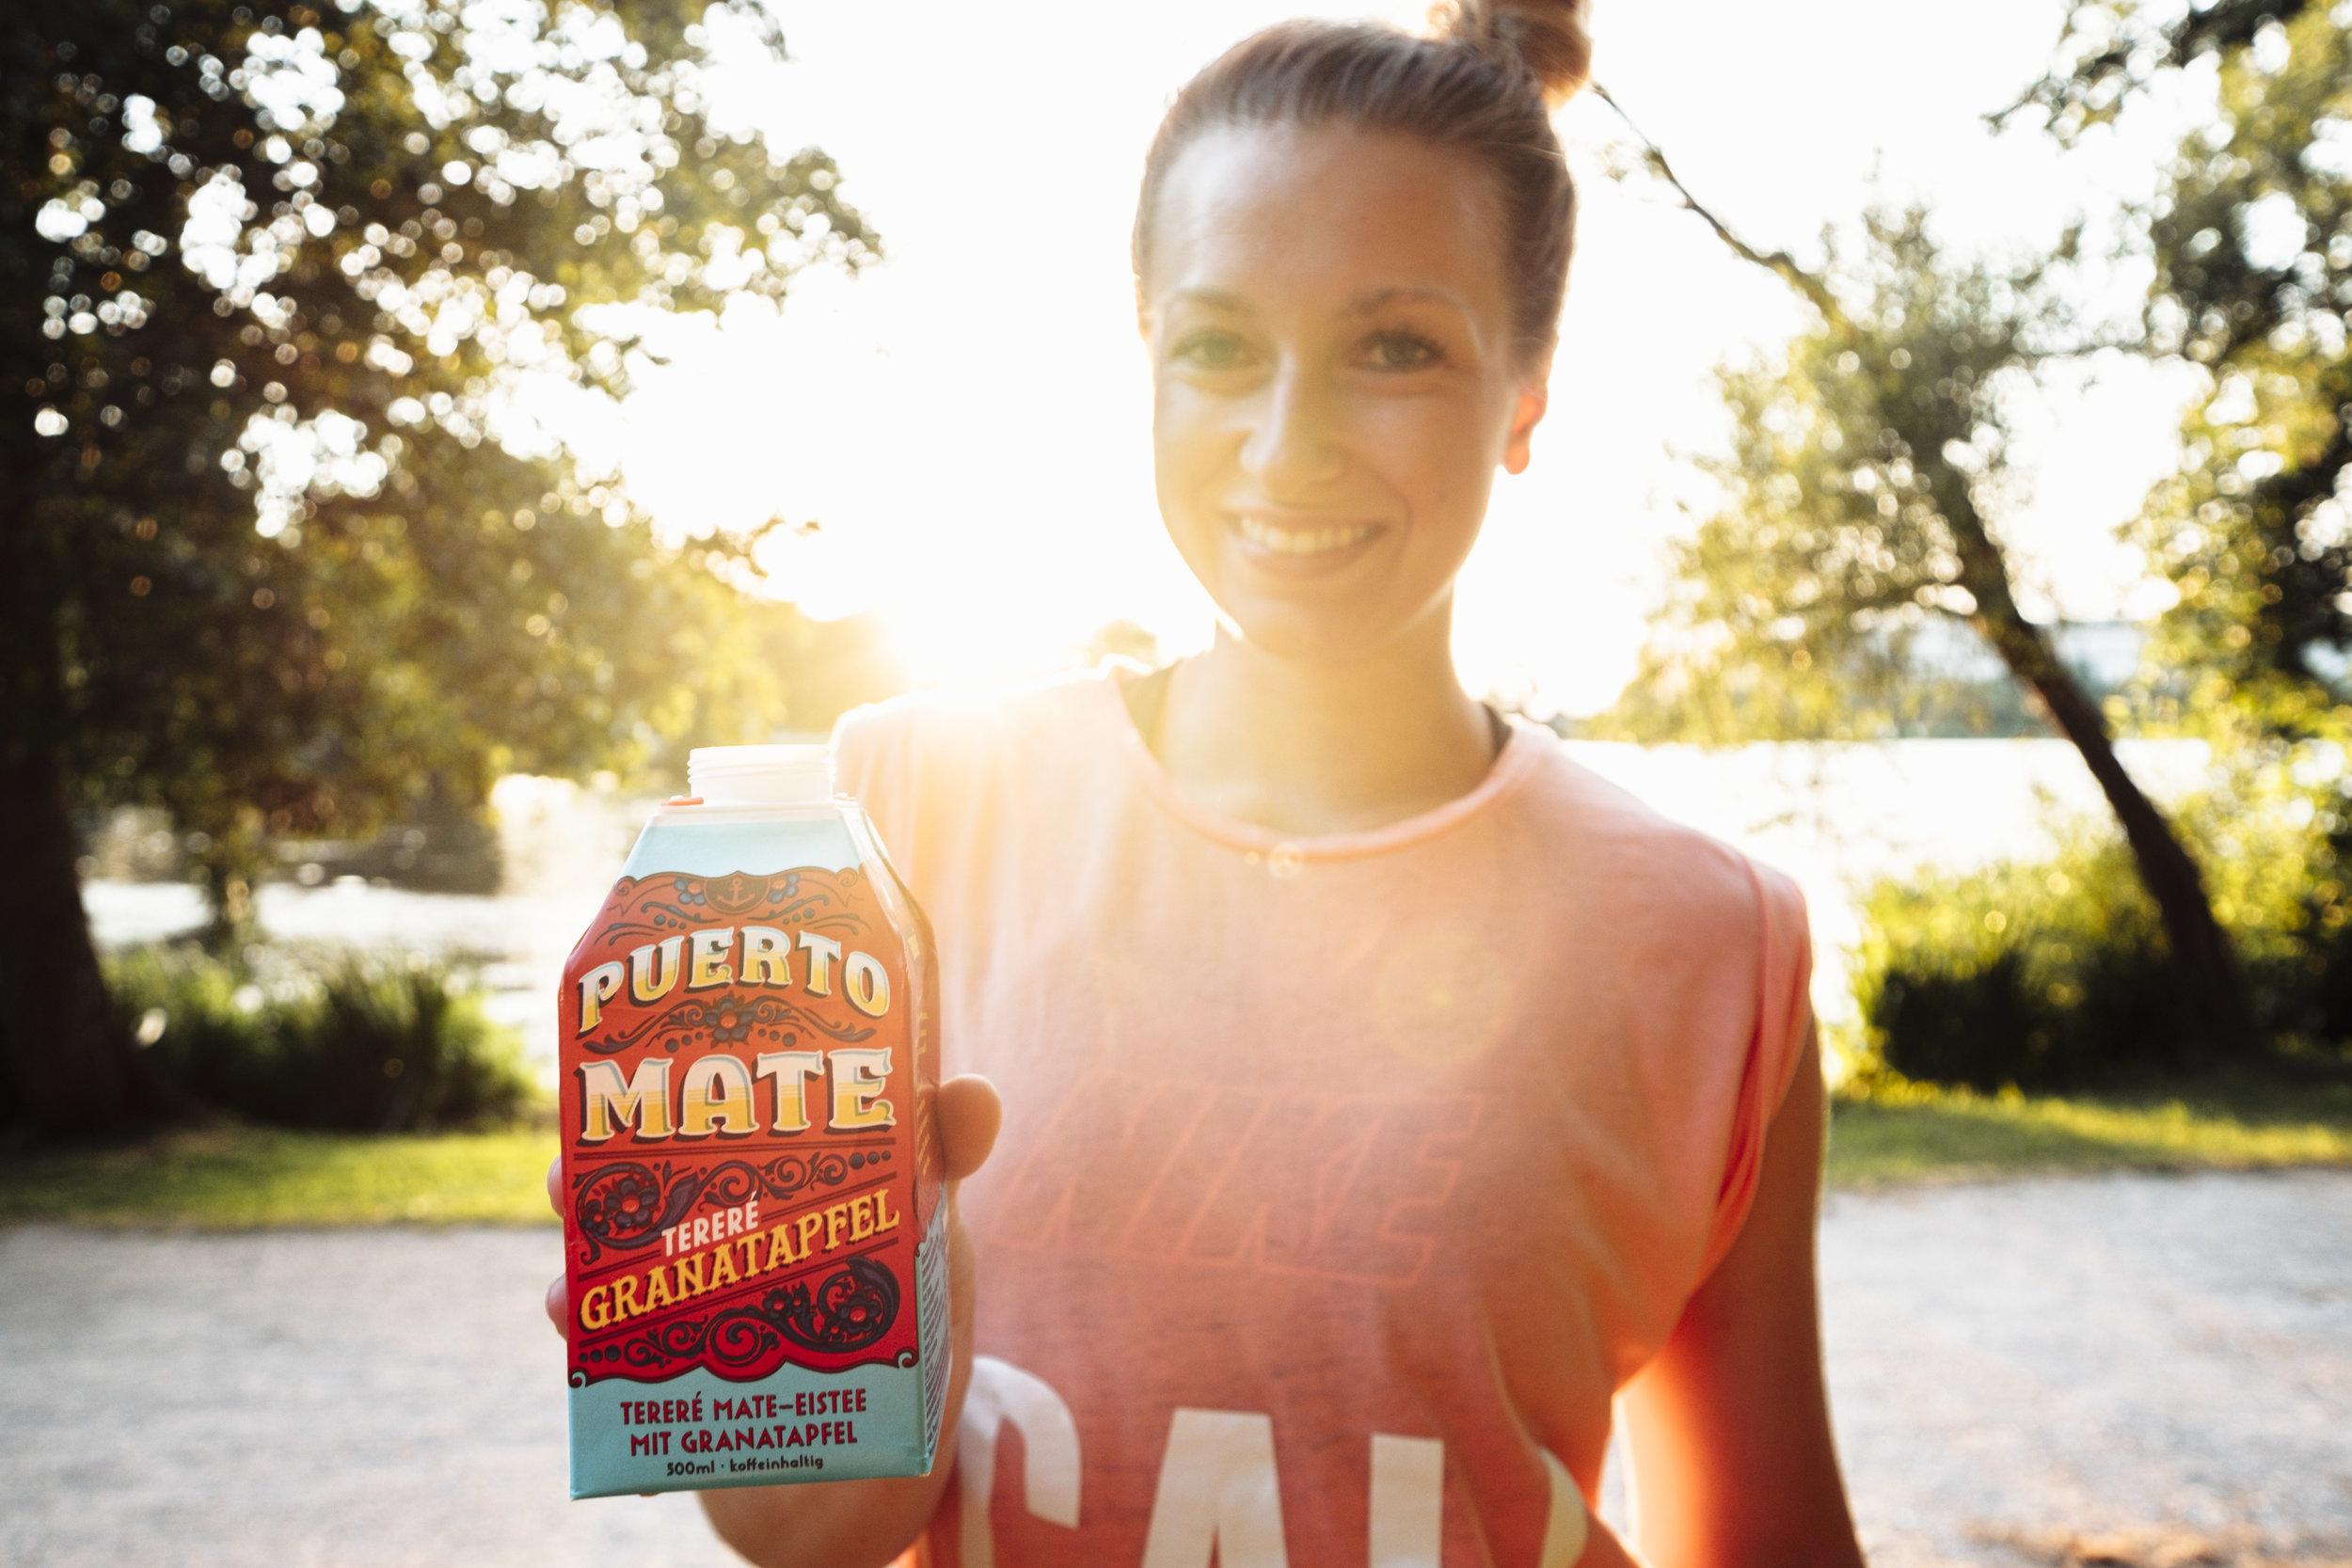 Puerto Mate | Lifestyle series |Dijk Agency